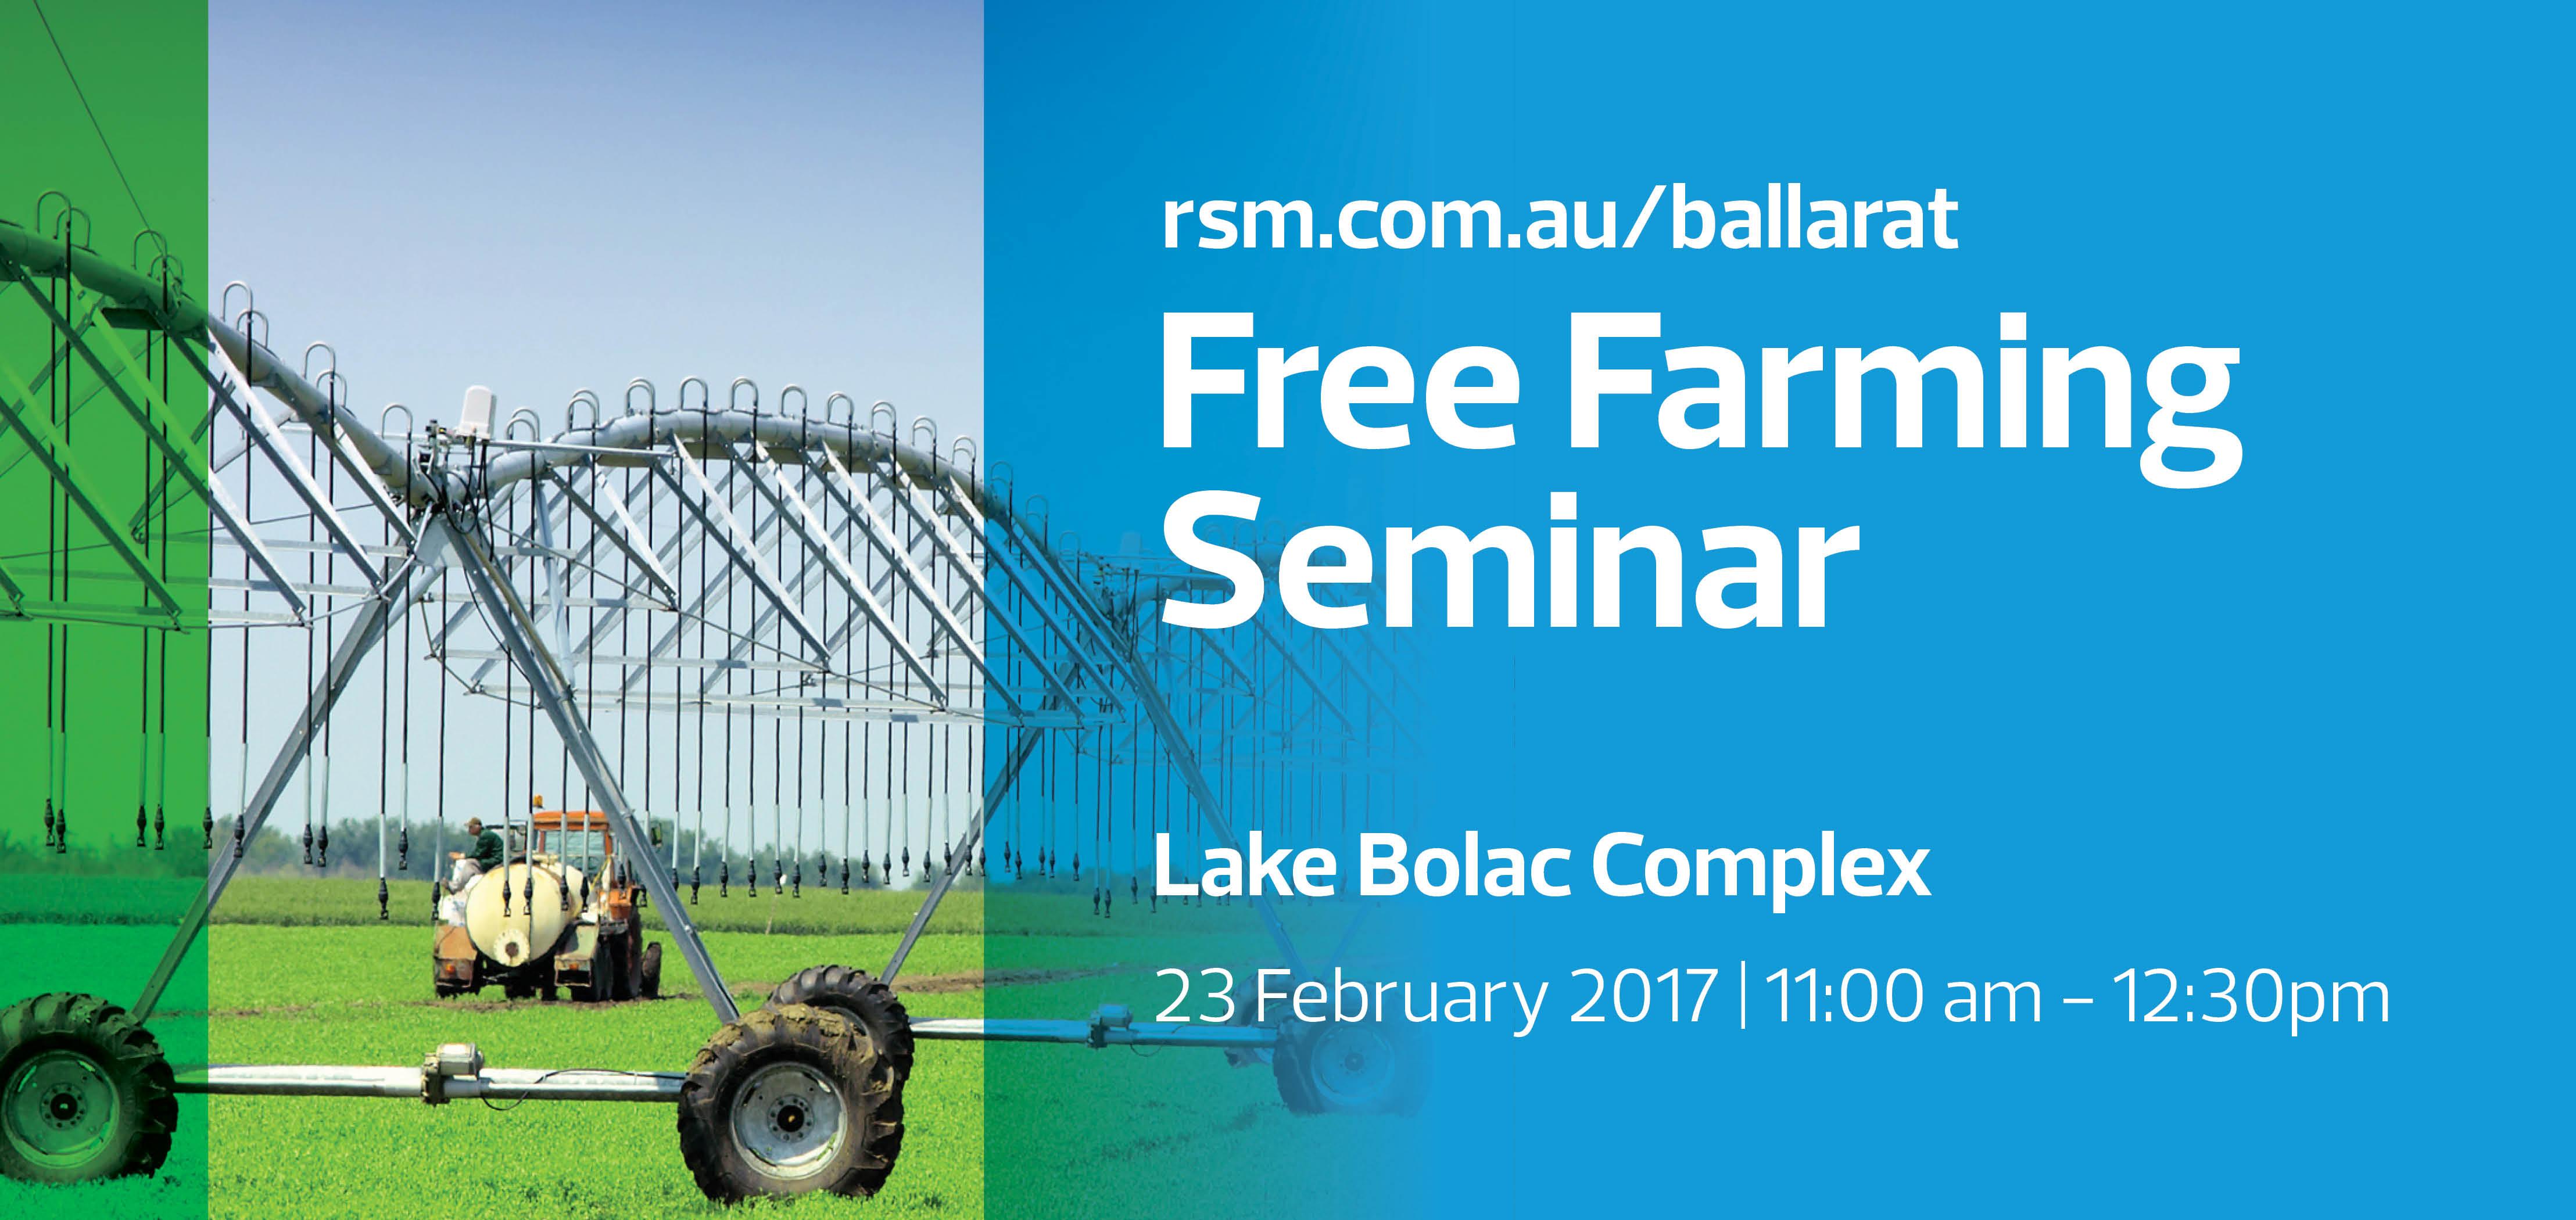 public://media/Article Thumbnail Images/Article Specific Images/Events/1702_farming_seminar_ballarat_fb2.jpg